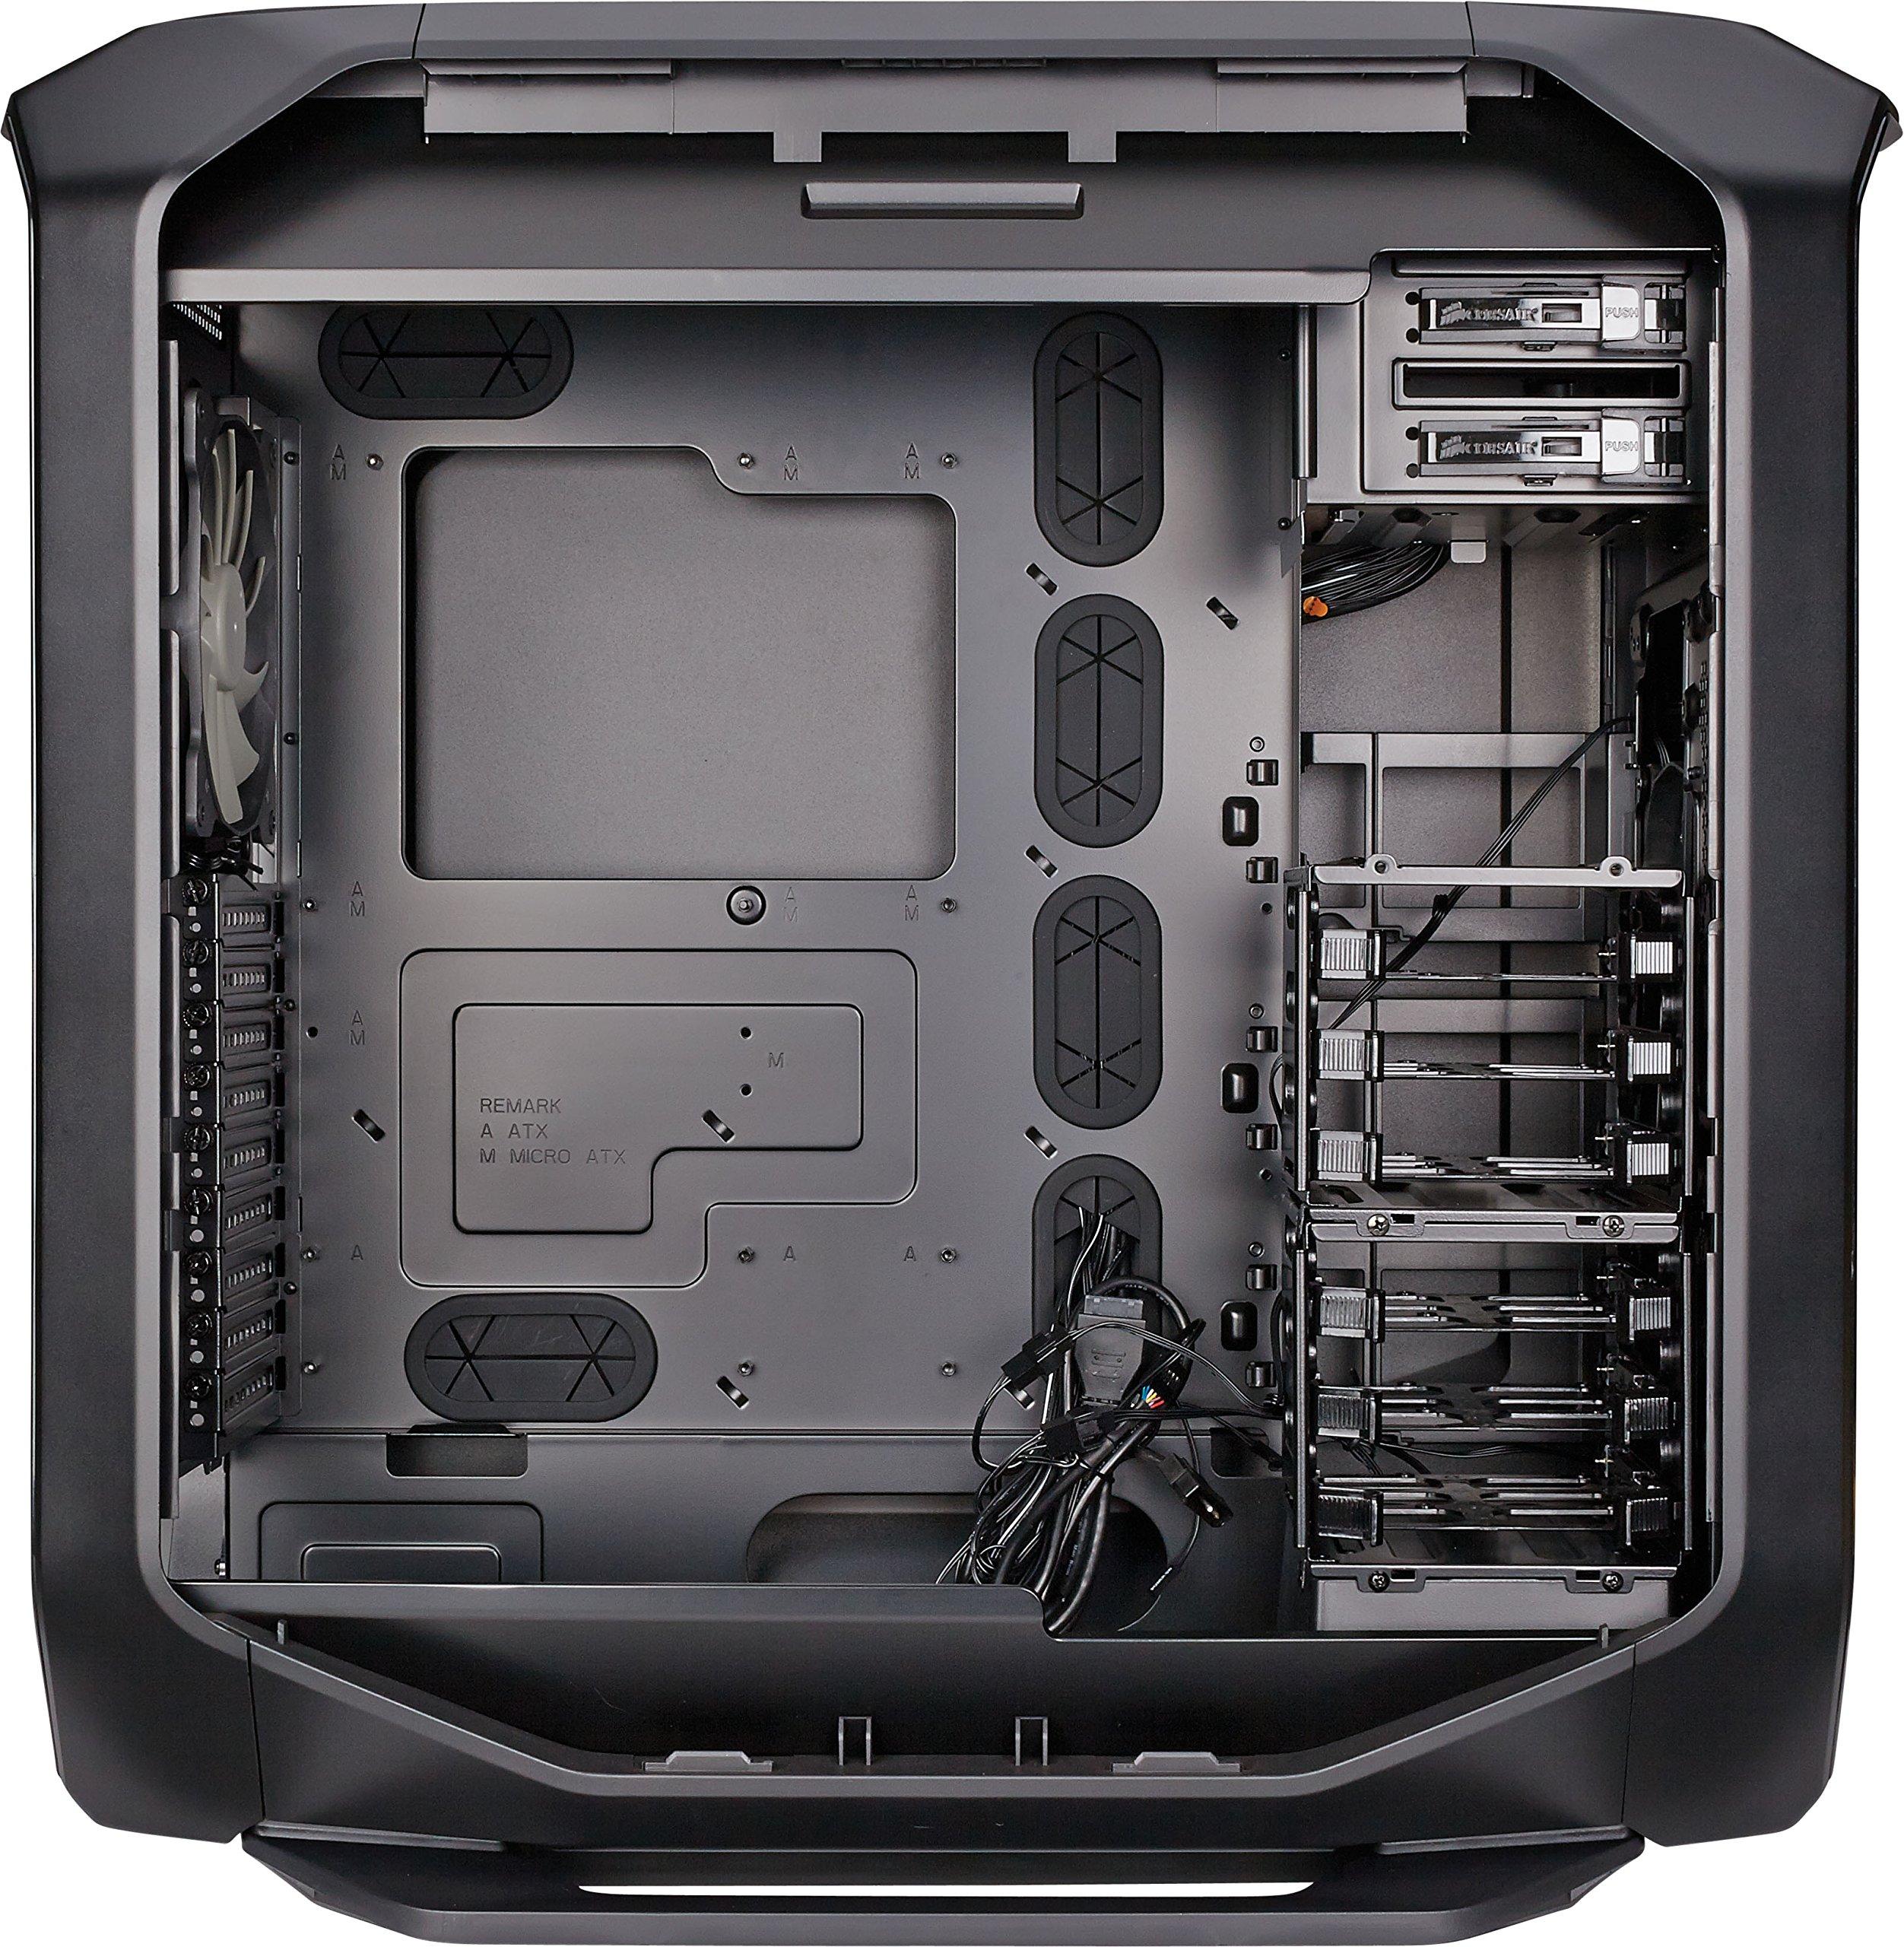 Corsair Graphite Series 780T Full Tower PC Case - Black by Corsair (Image #7)